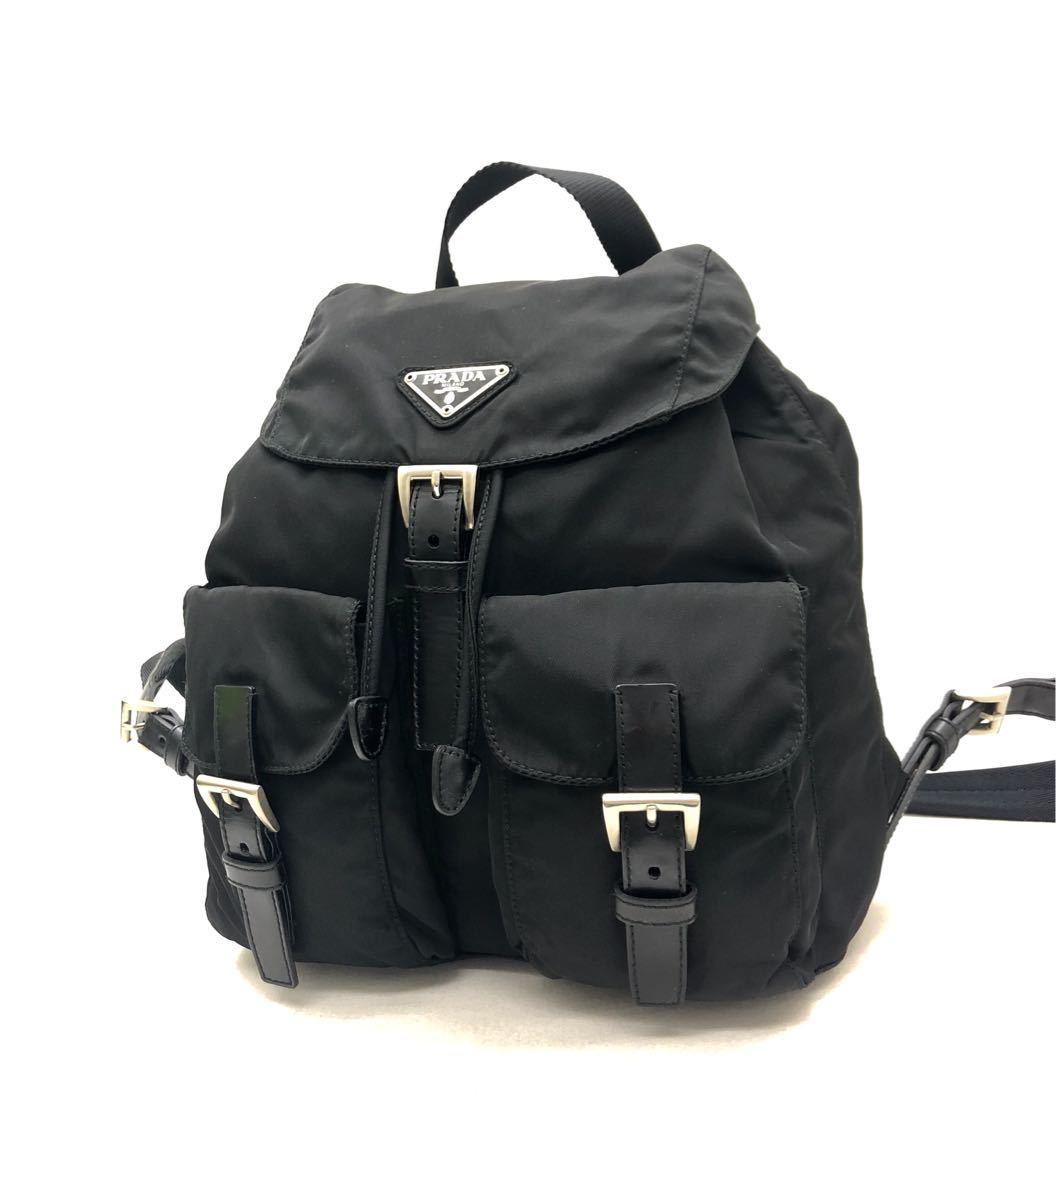 19d1496fe5e4 極美品 PRADA プラダ テスート ナイロン リュックサック バックパック ブラック 黒 13